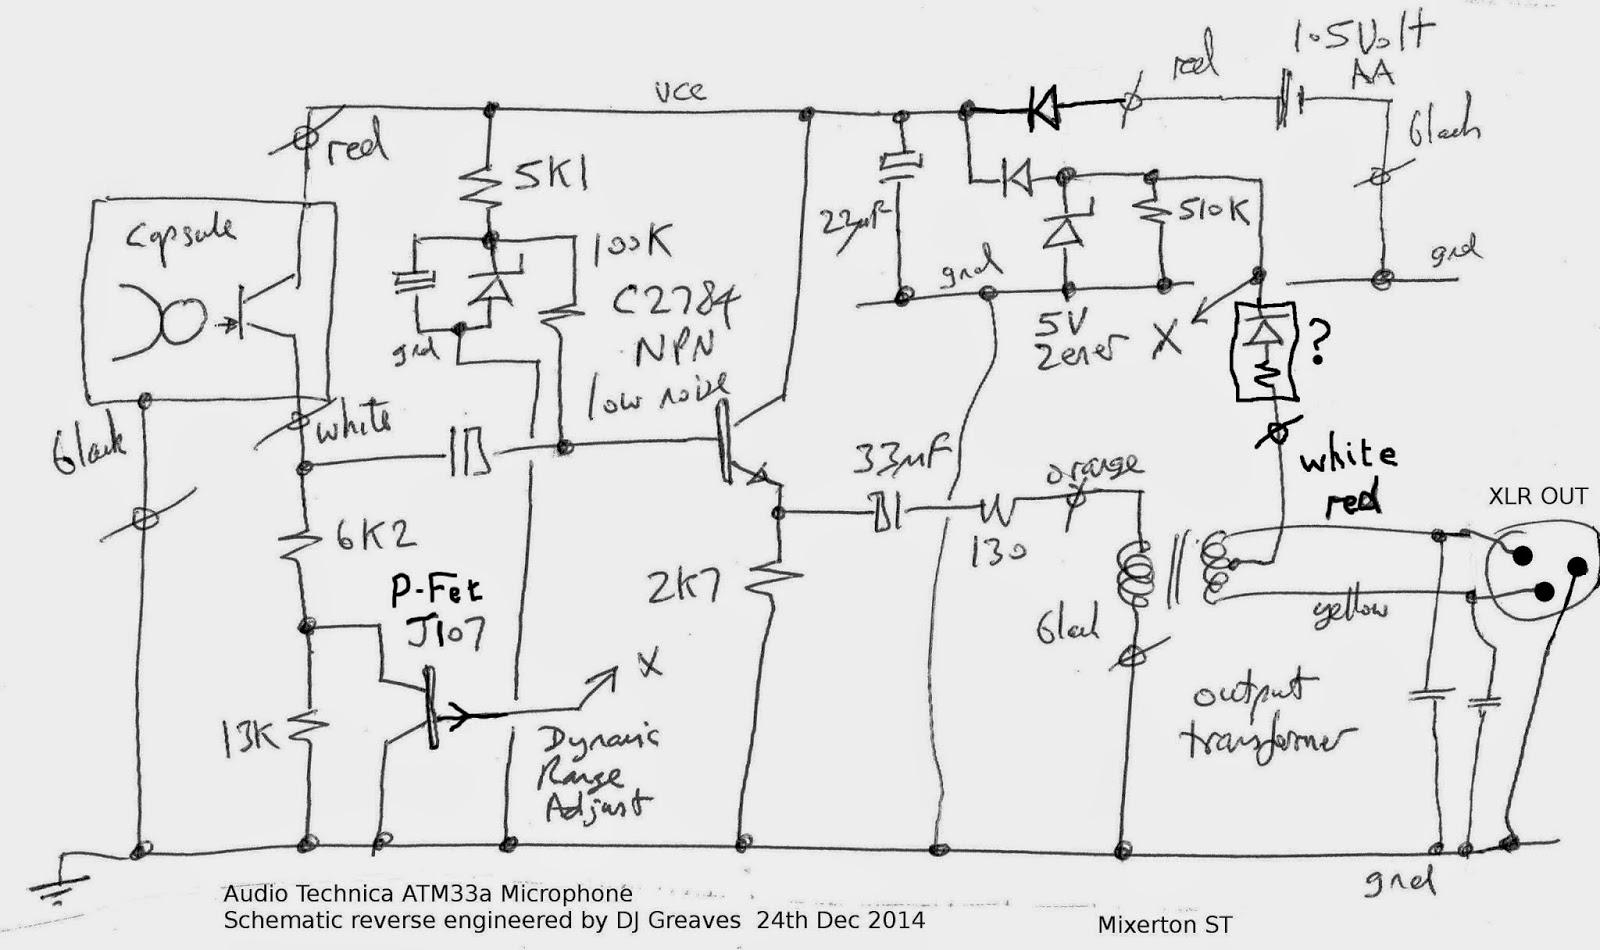 olds turn signal wiring diagram wiring library rh 18 mac happen de signal light wiring diagram signal stat 900 schematic [ 1600 x 950 Pixel ]